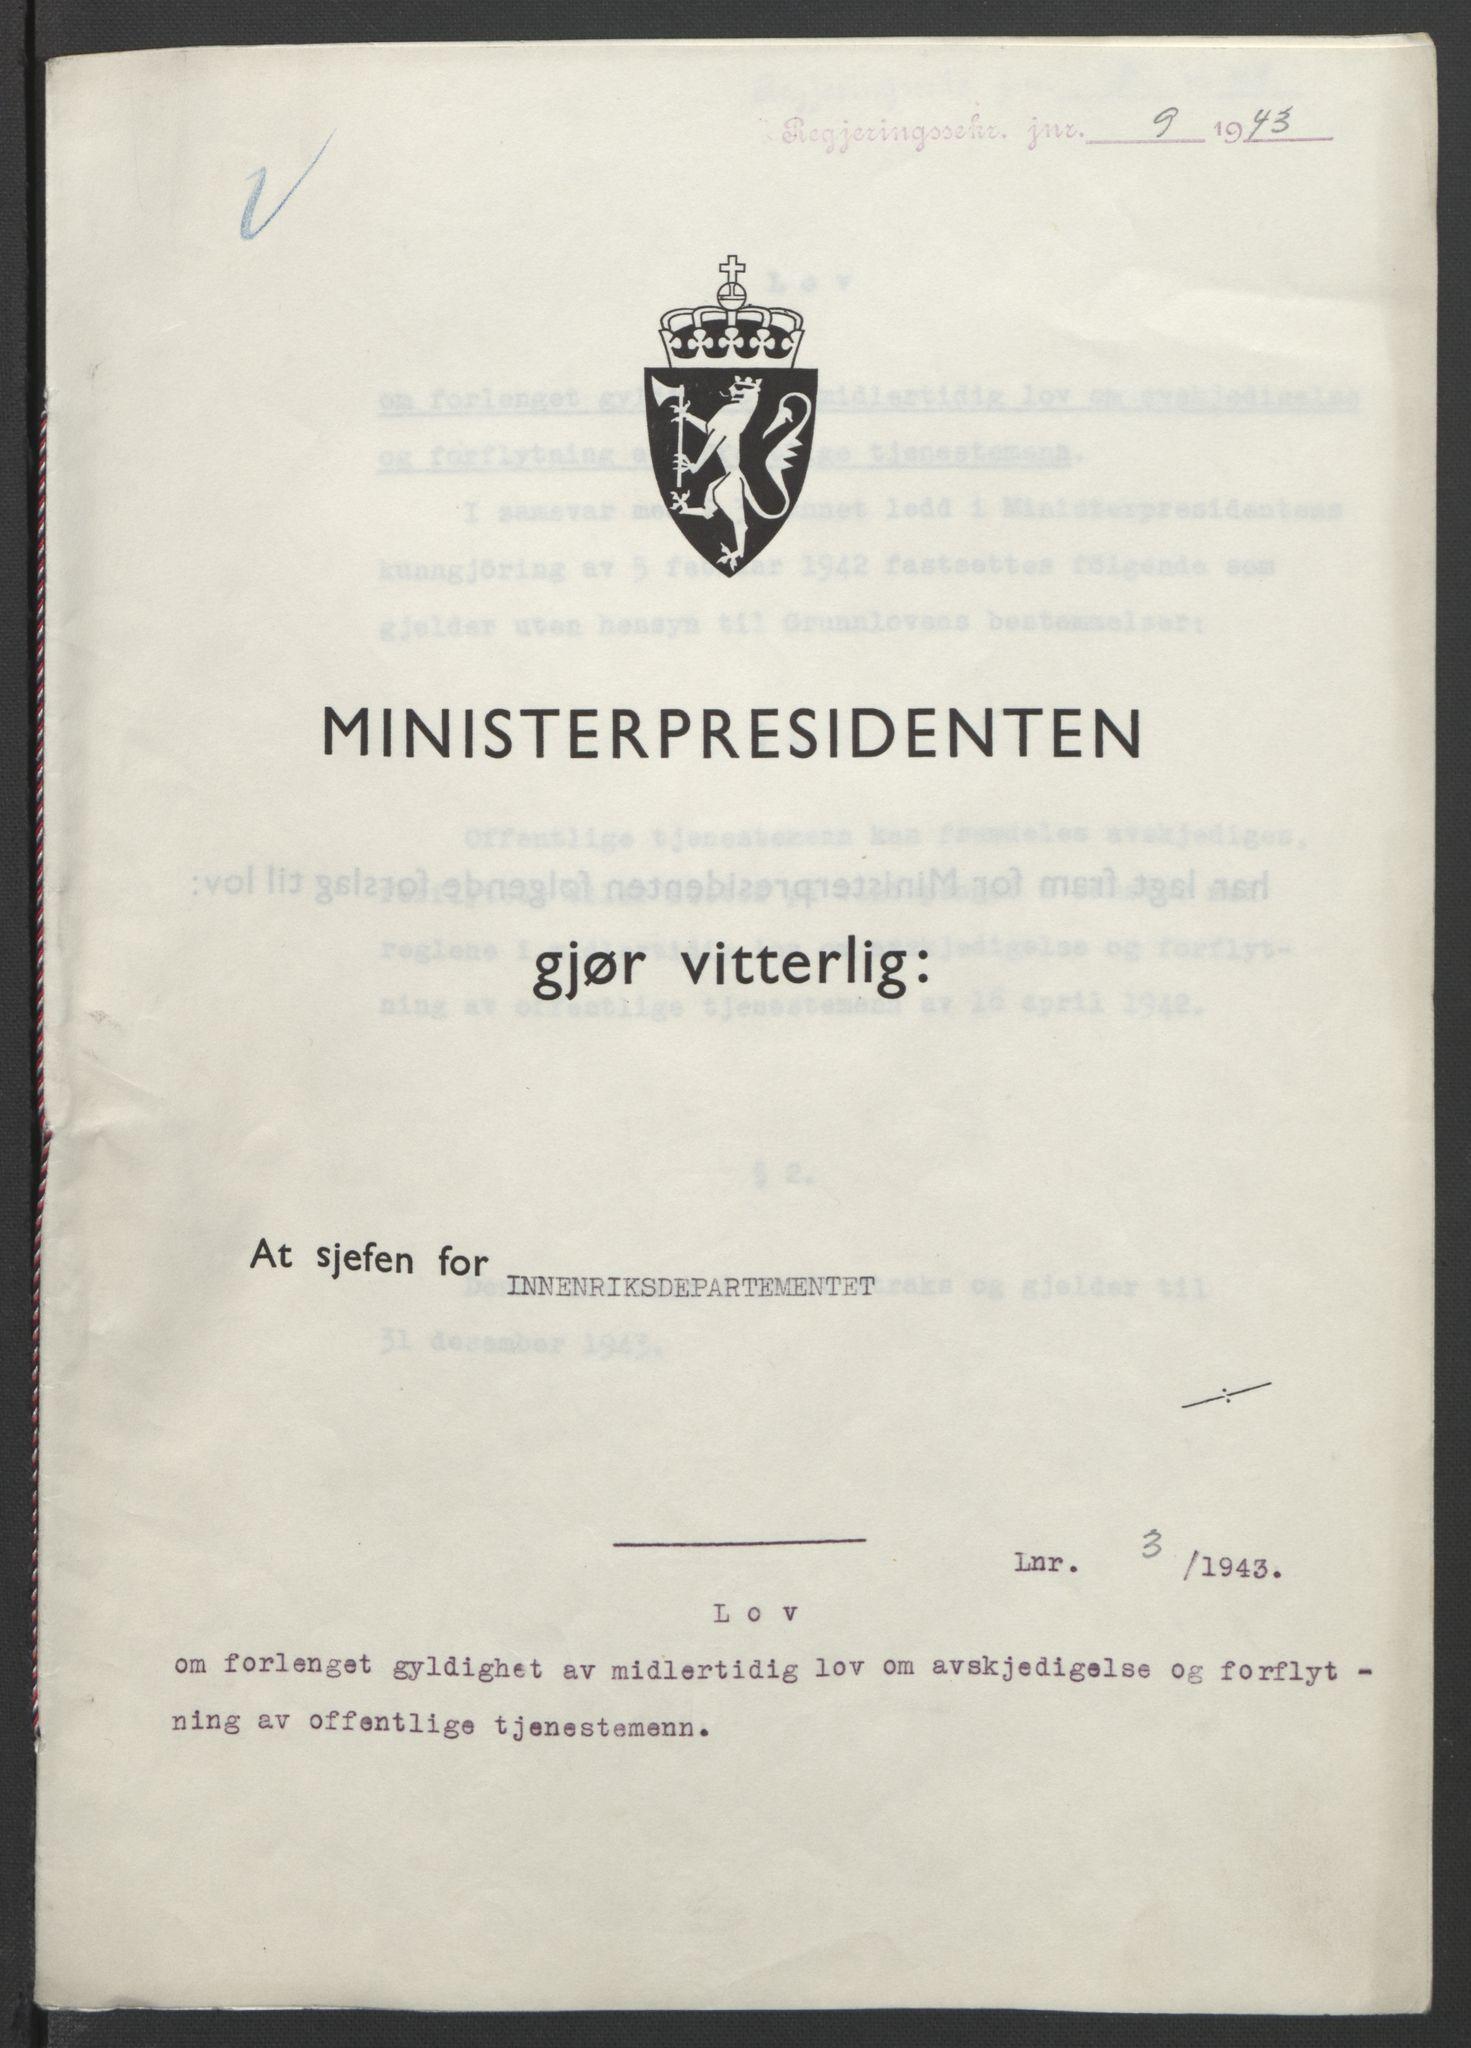 RA, NS-administrasjonen 1940-1945 (Statsrådsekretariatet, de kommisariske statsråder mm), D/Db/L0099: Lover, 1943, s. 14